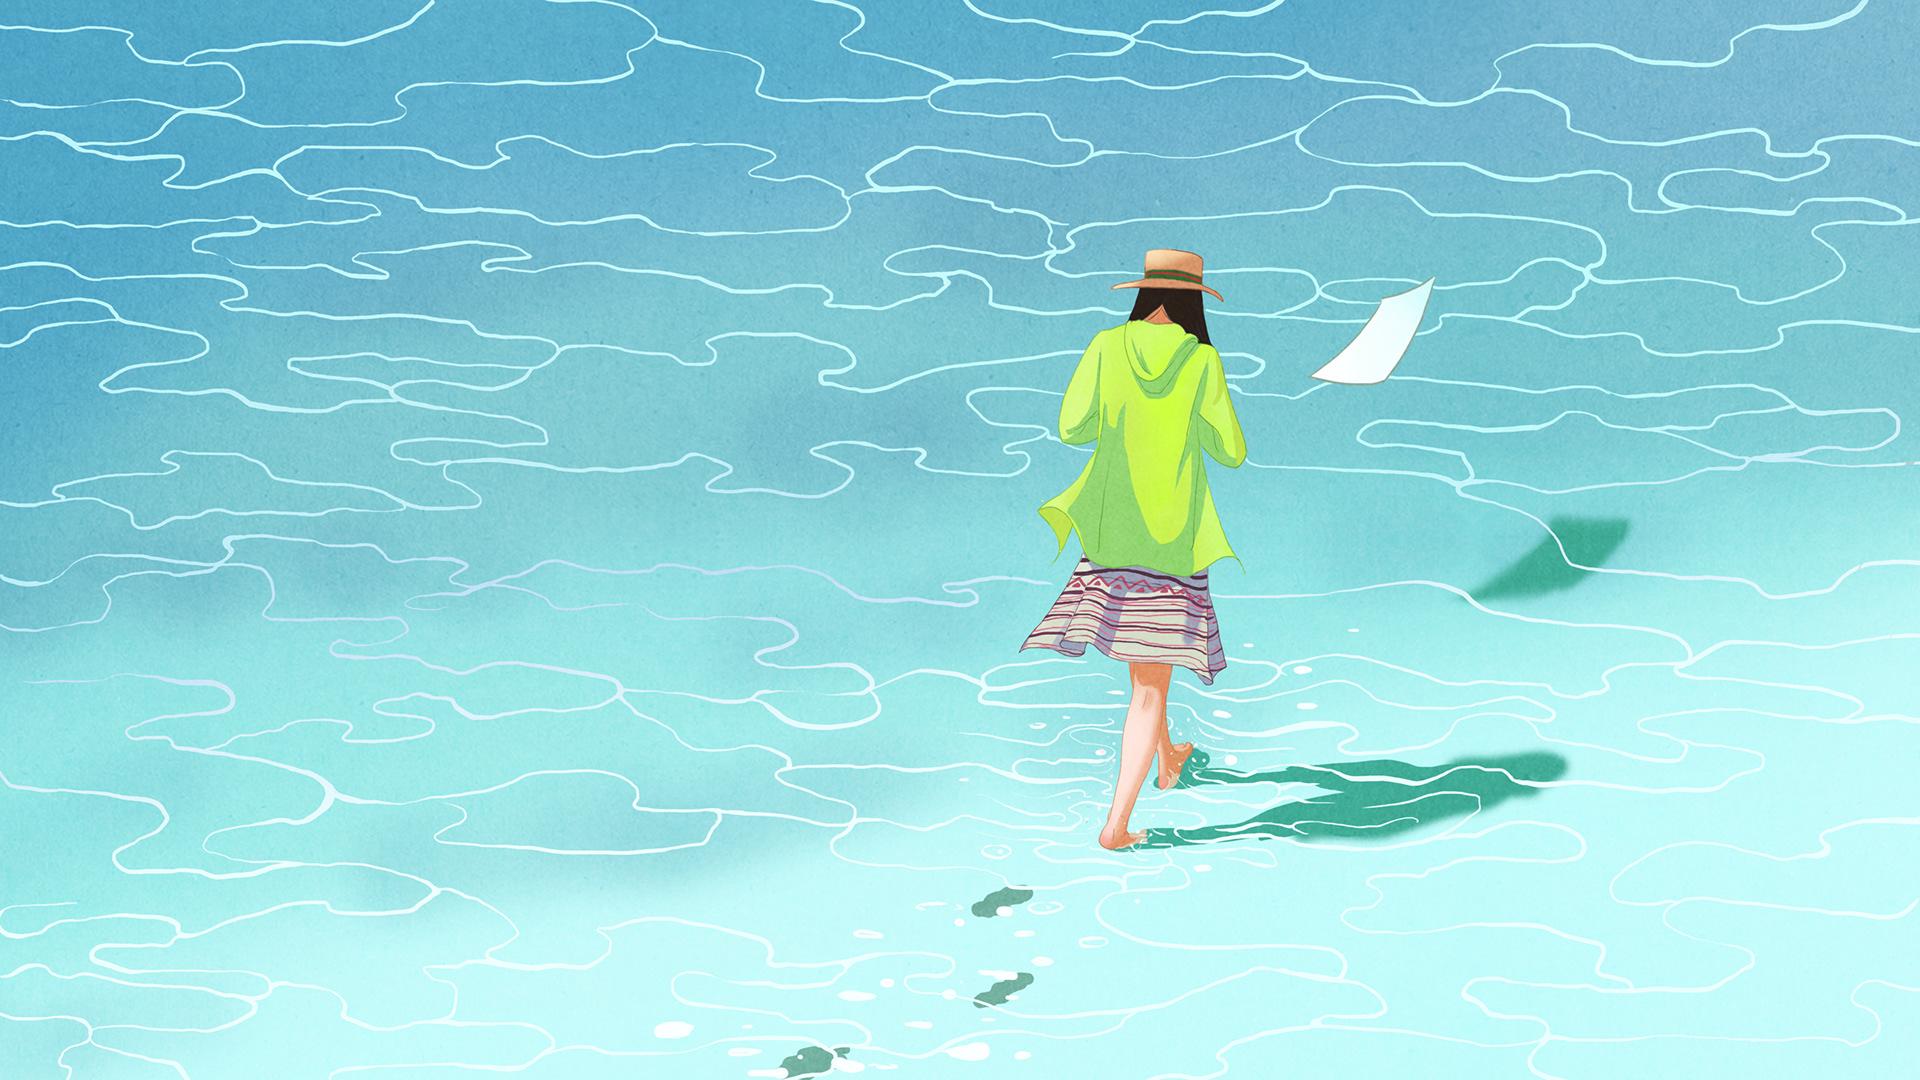 Graphic Design,Illustration,Painting